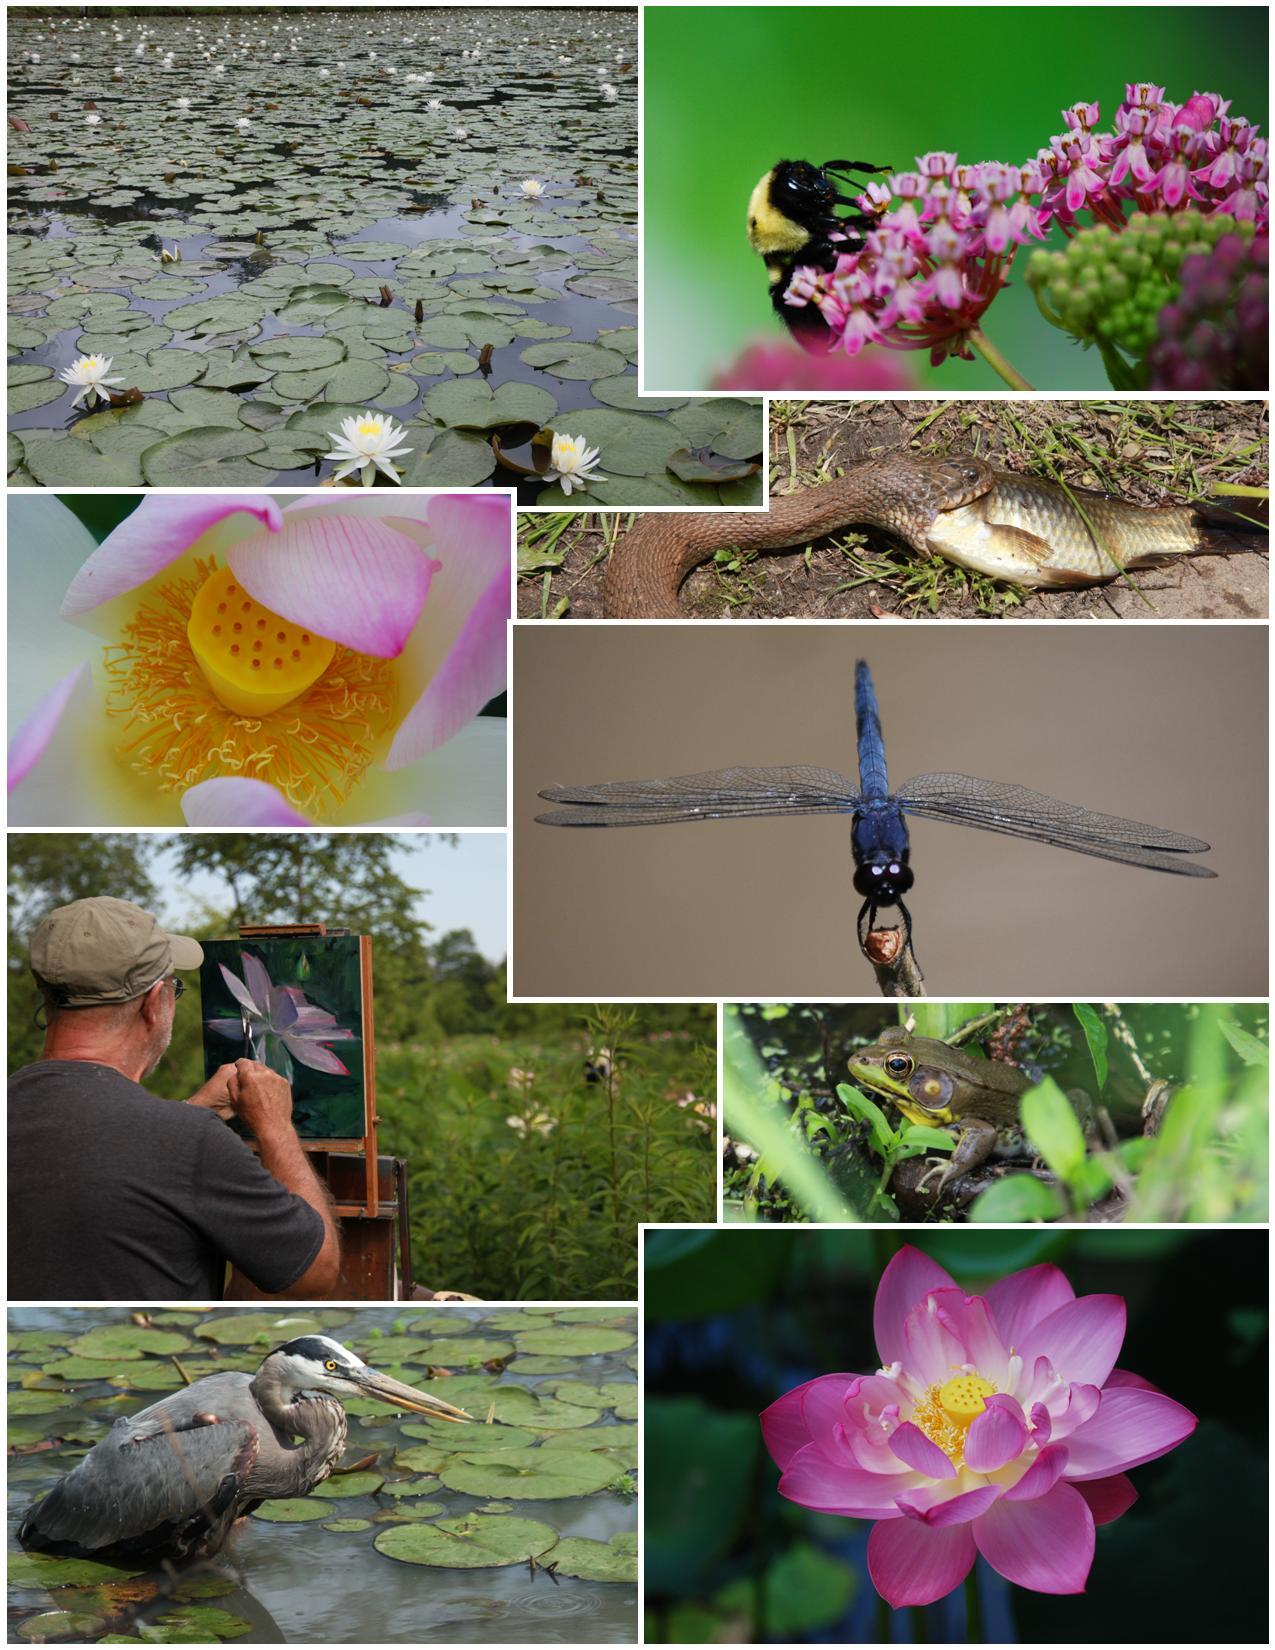 Photos Multimedia Kenilworth Park Aquatic Gardens U S National Park Service